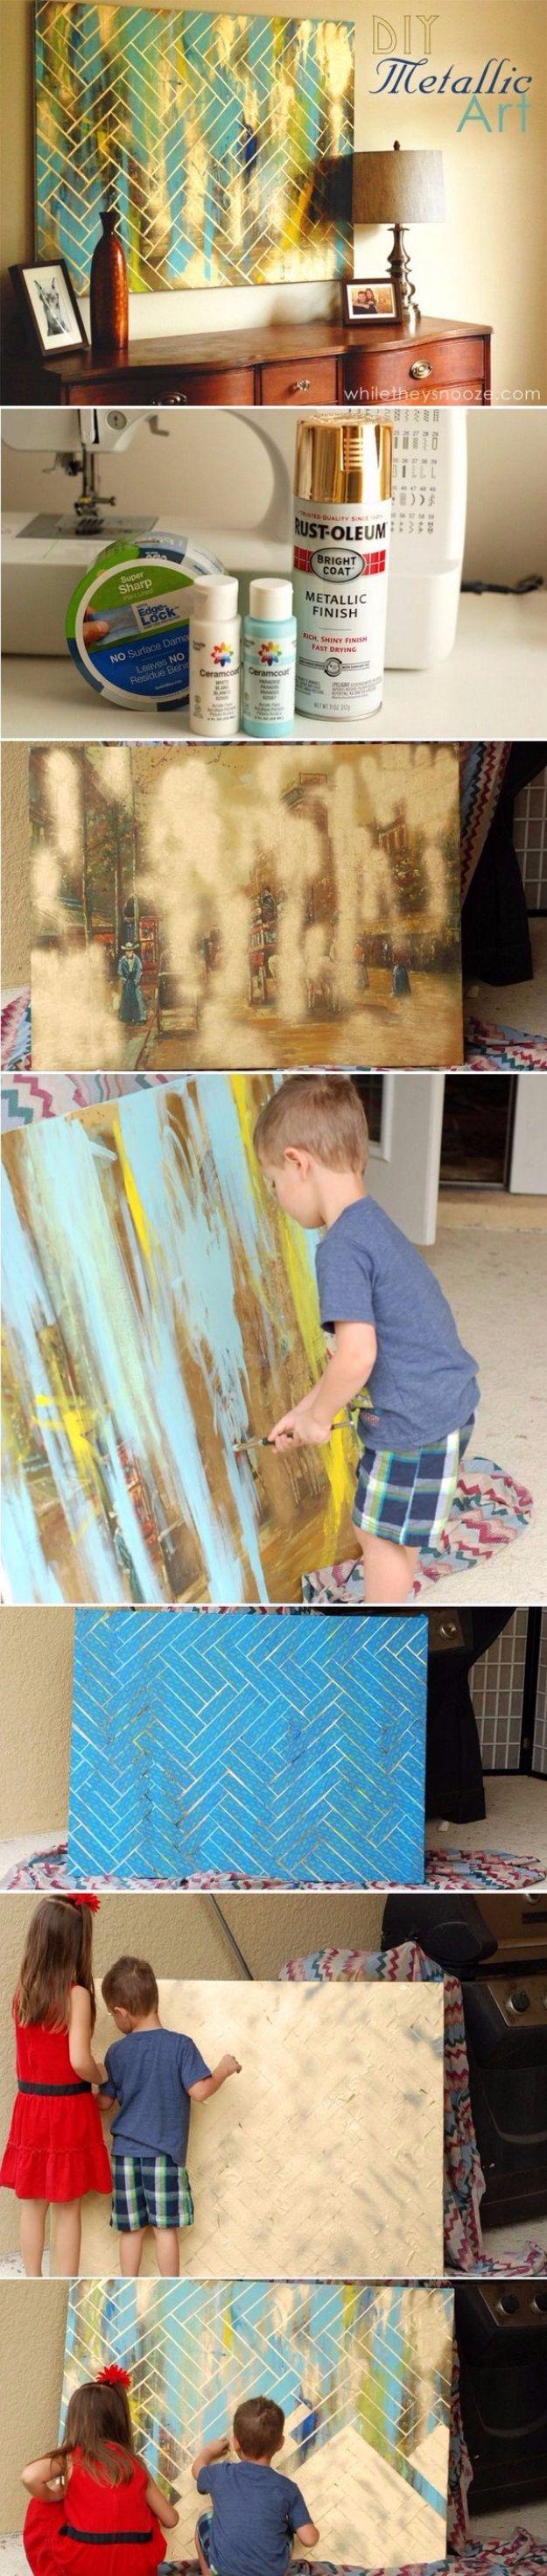 DIY Canvas Painting Ideas - DIY Herringbone Metallic Artwork - Cool and Easy Wall Art Ideas You Can Make On A Budget #painting #diyart #diygifts